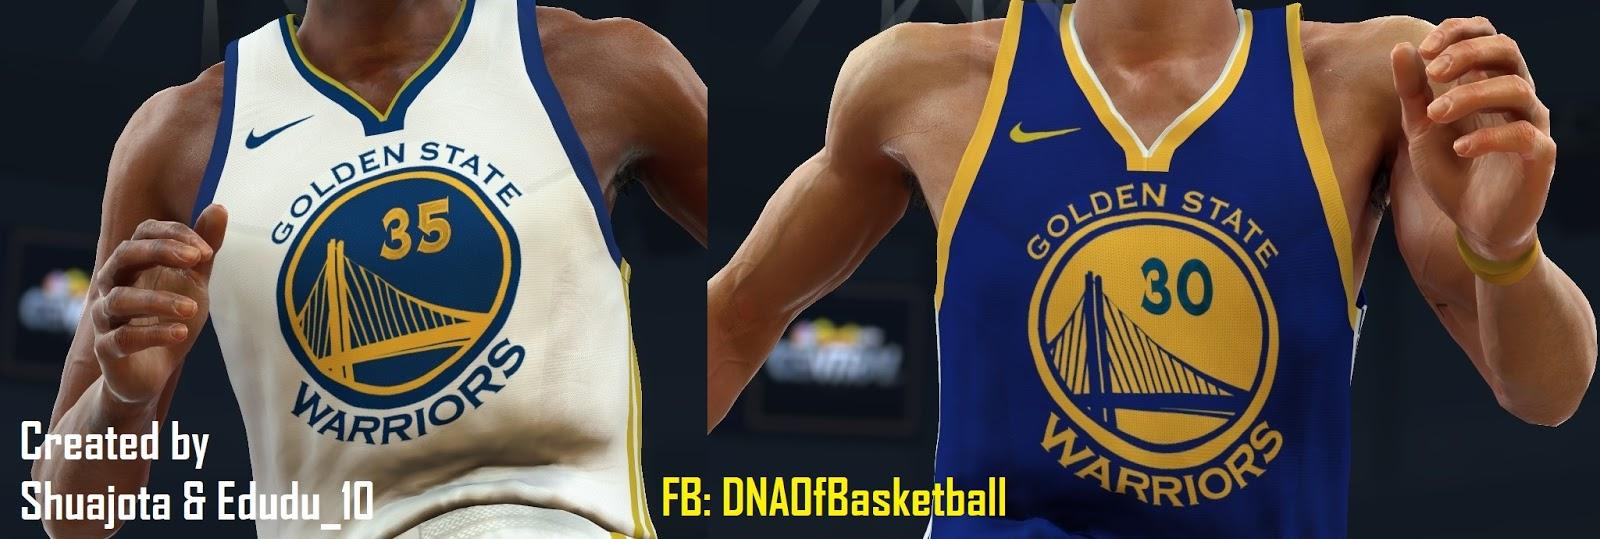 DNA Of Basketball | DNAOBB: NBA 2K17 Golden State Warriors Jerseys 2017-2018 by Shuajota & Edudu ...